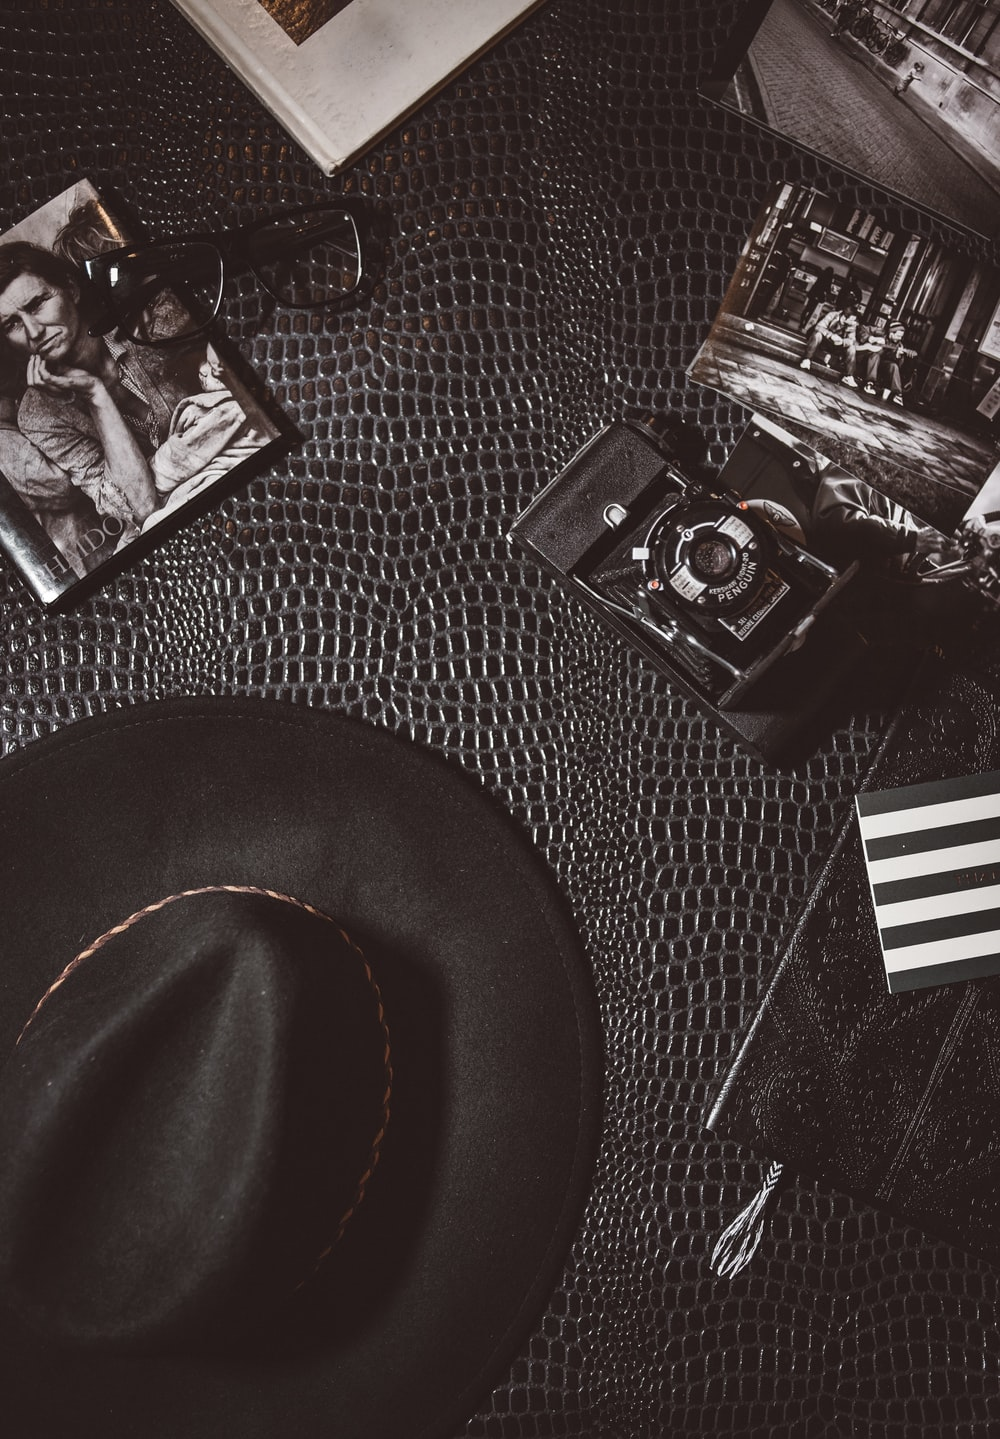 camera beside black hat